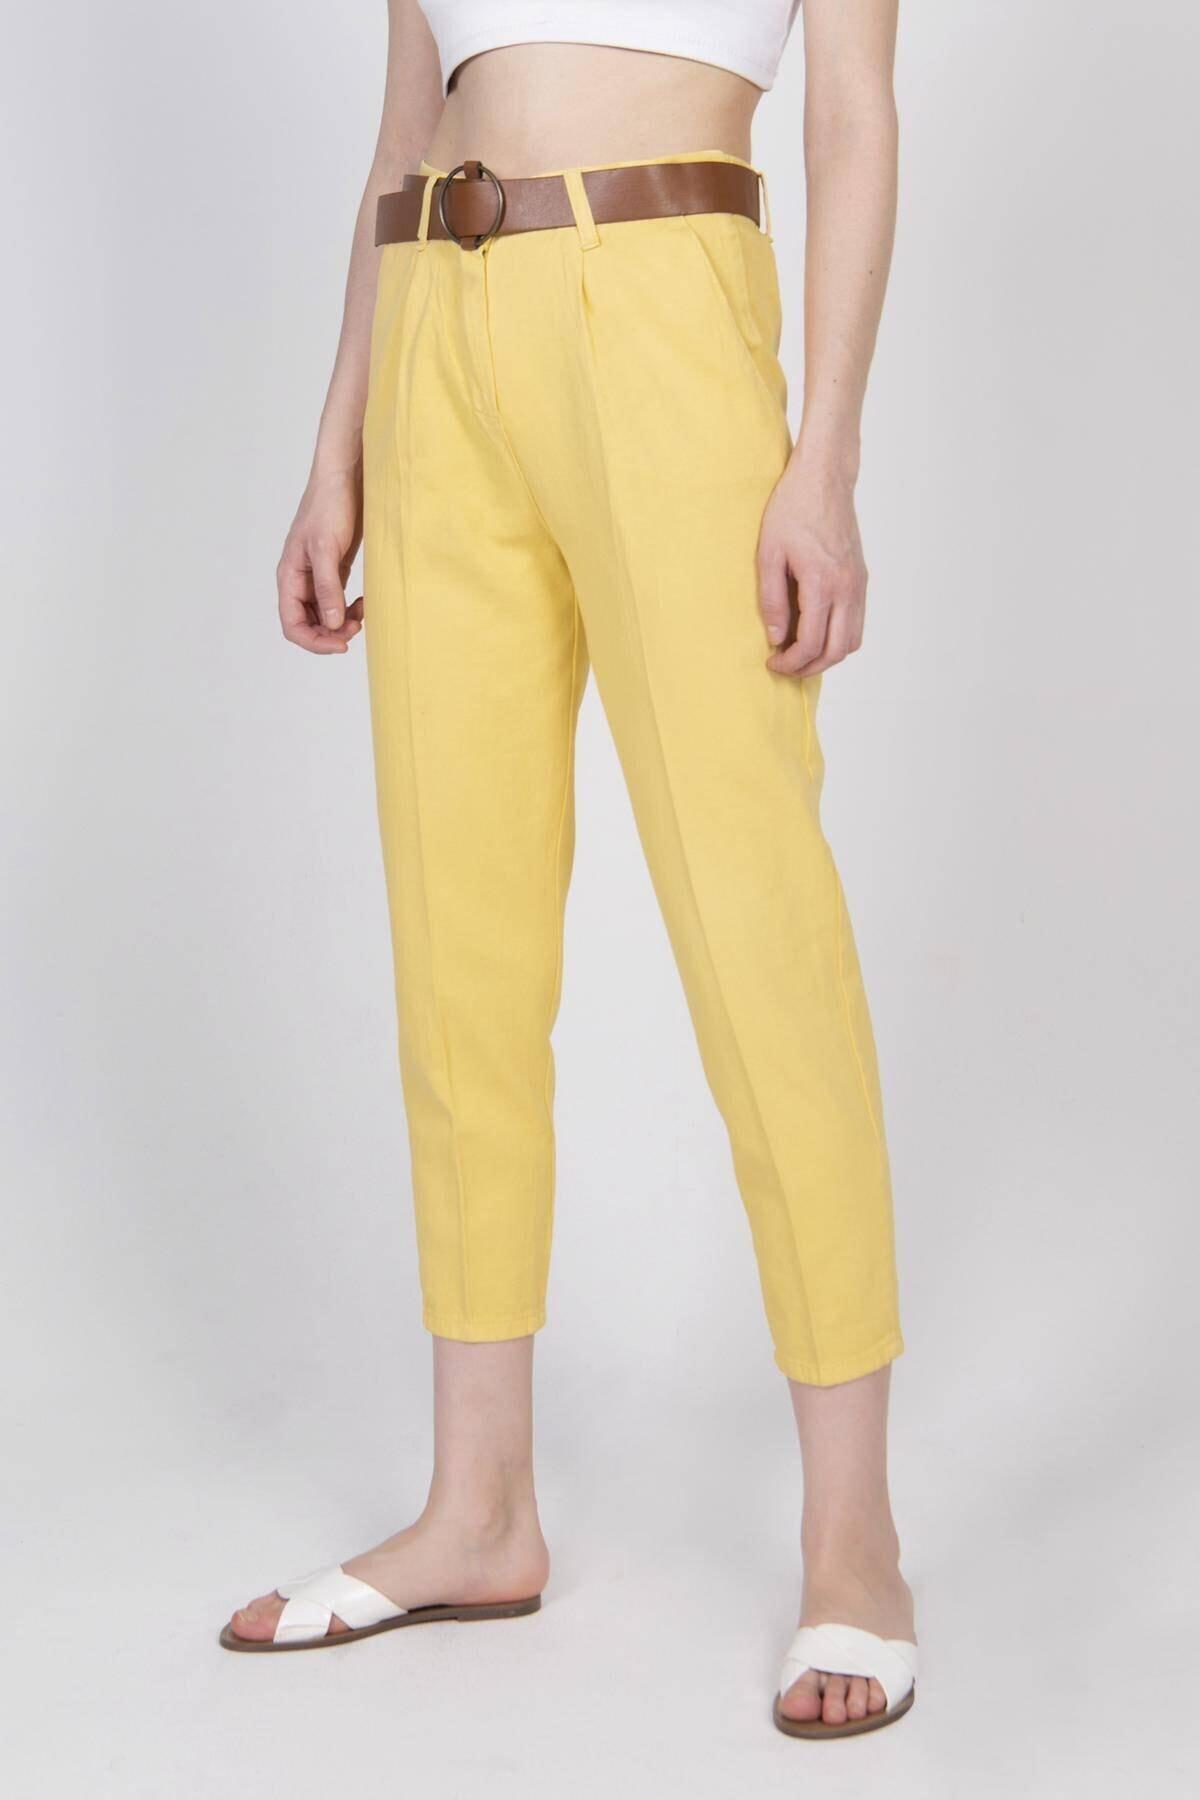 Addax Kadın Sarı Kemerli Pantolon PN4204 - T3 ADX-0000020952 0